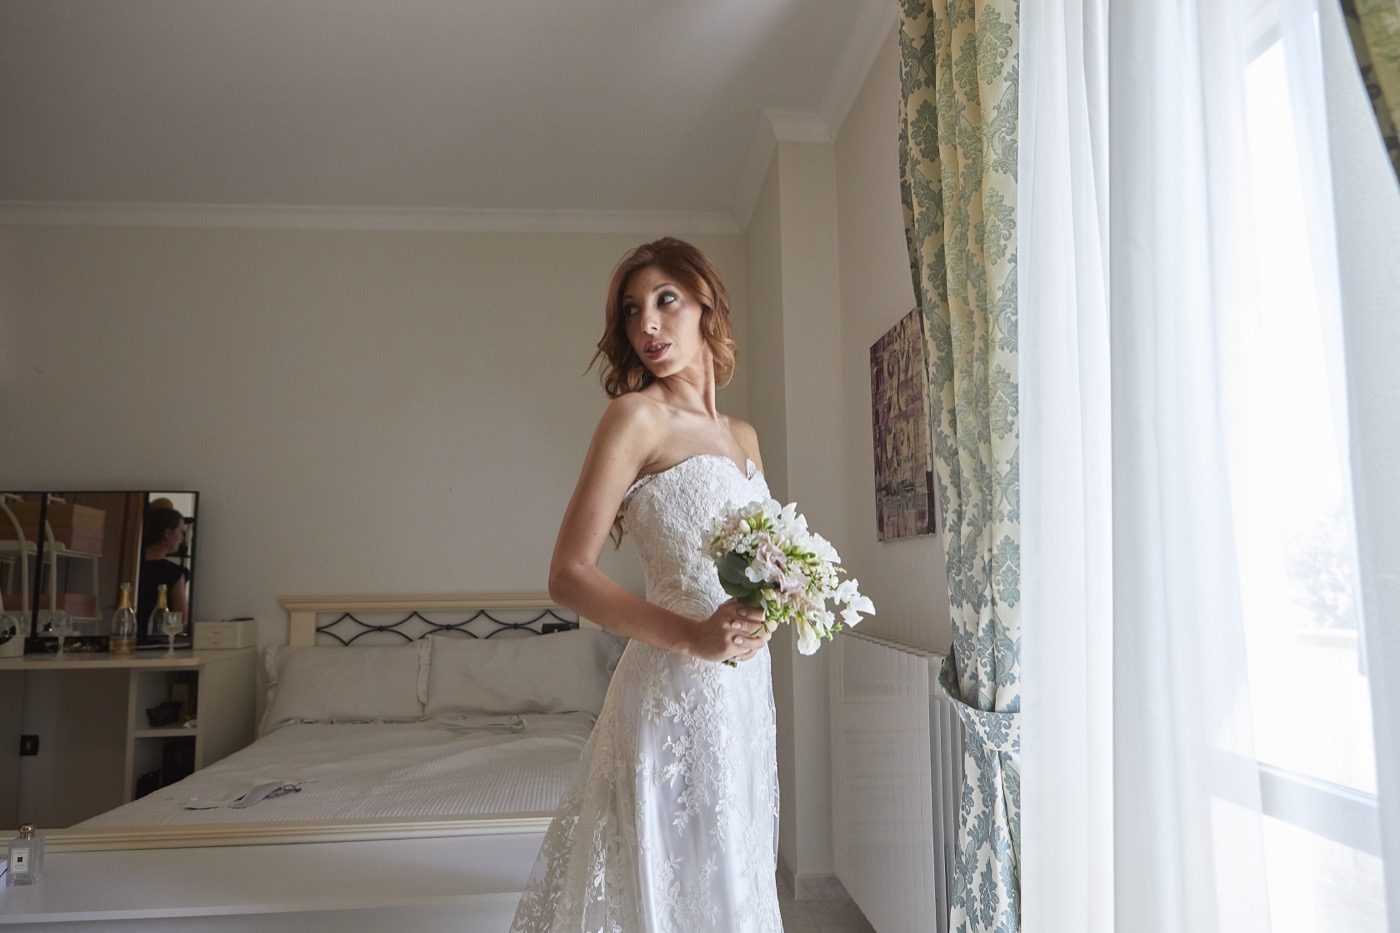 Claudio-Coppola-wedding-photographer-abbazia-7-frati-piegaro-33